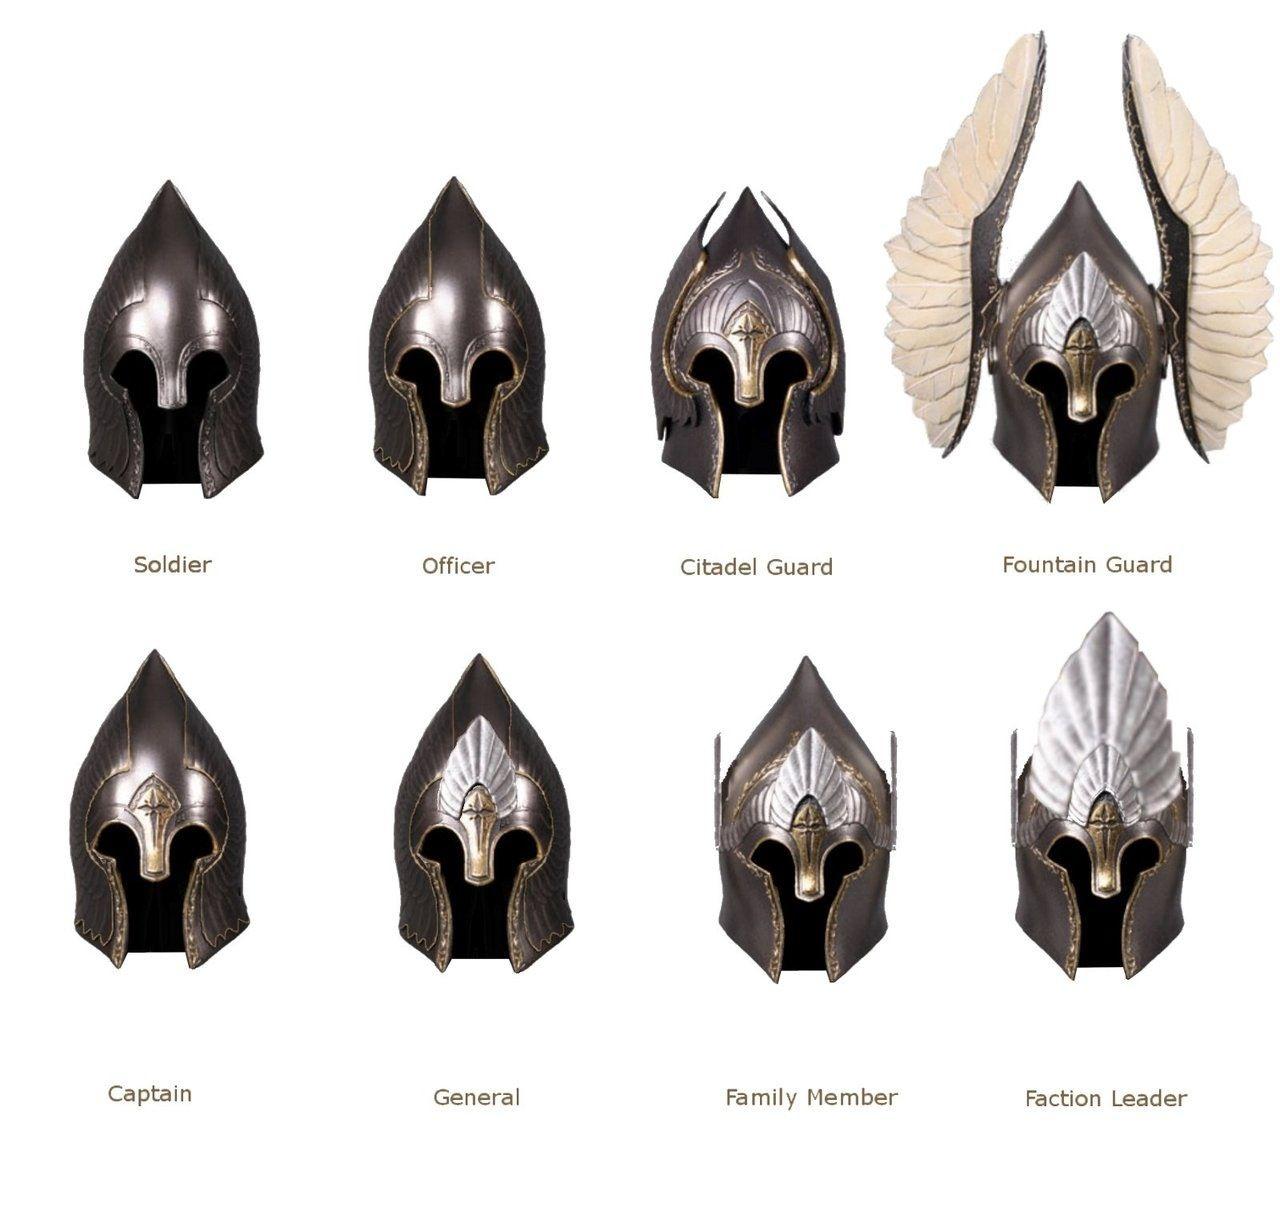 Ranks of the soldiers of Gondor lotr  TLOTR  Pinterest  LOTR